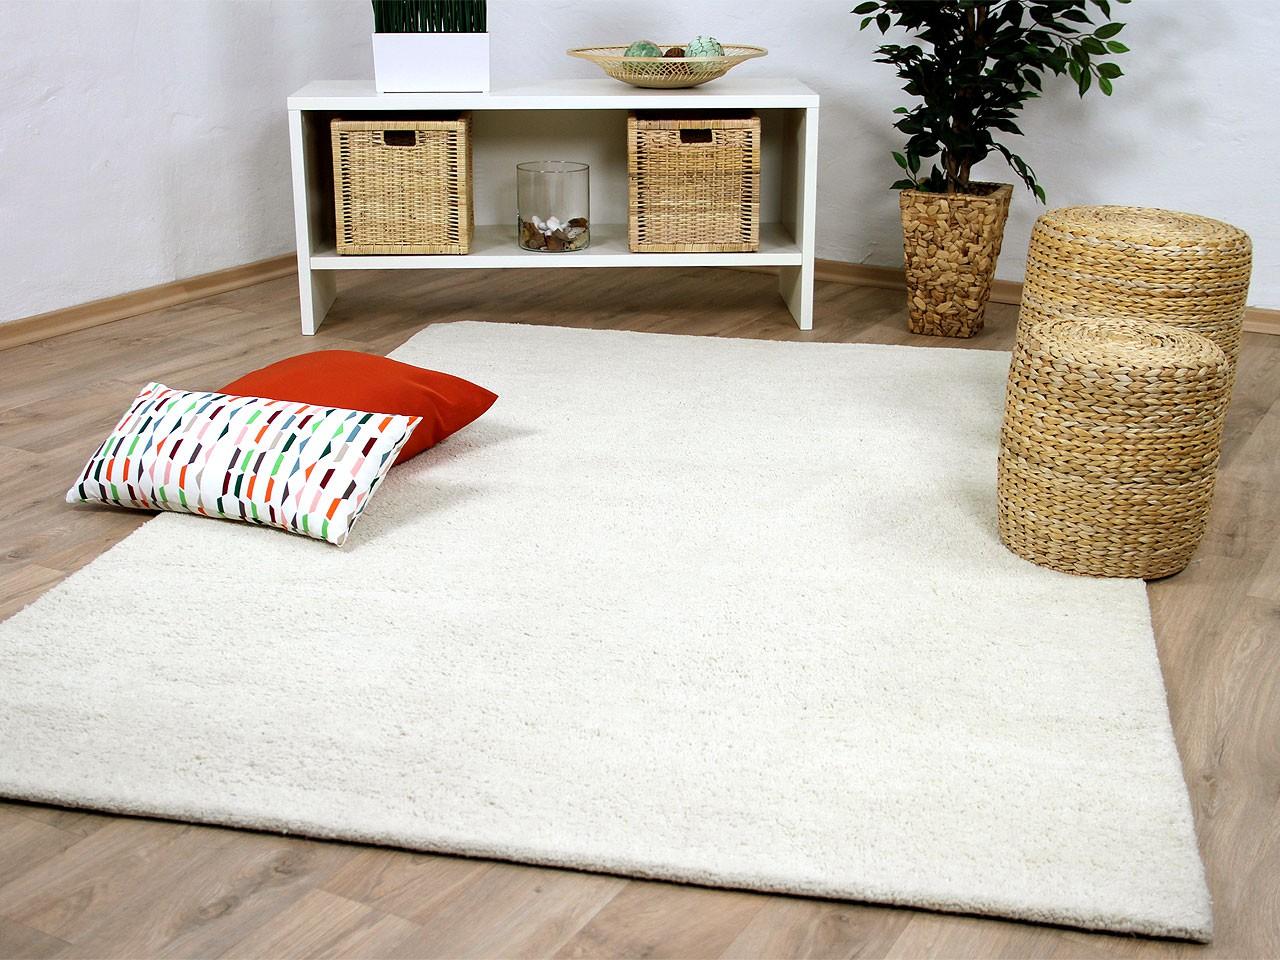 natur teppich berber aruna uni wollweiss teppiche sisal und naturteppiche berber teppiche. Black Bedroom Furniture Sets. Home Design Ideas